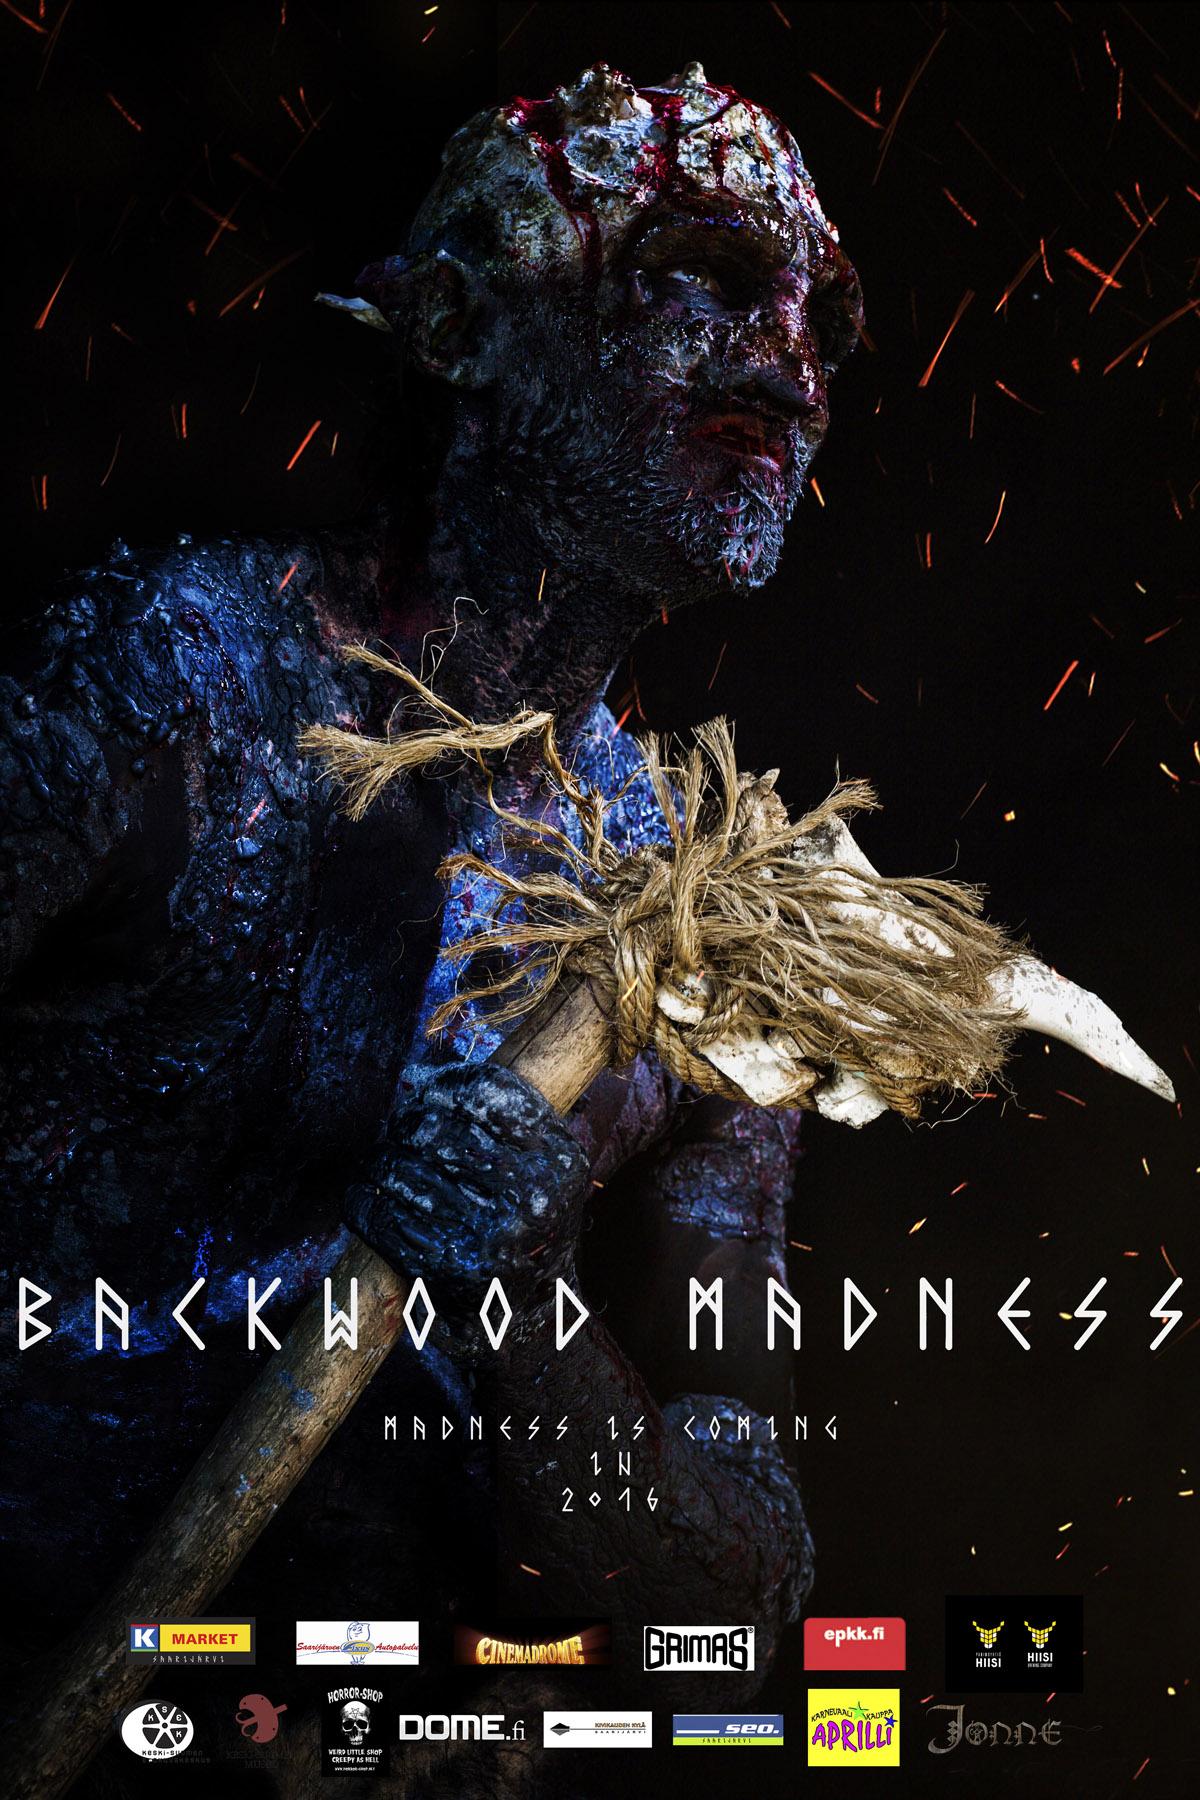 backwoodposter4